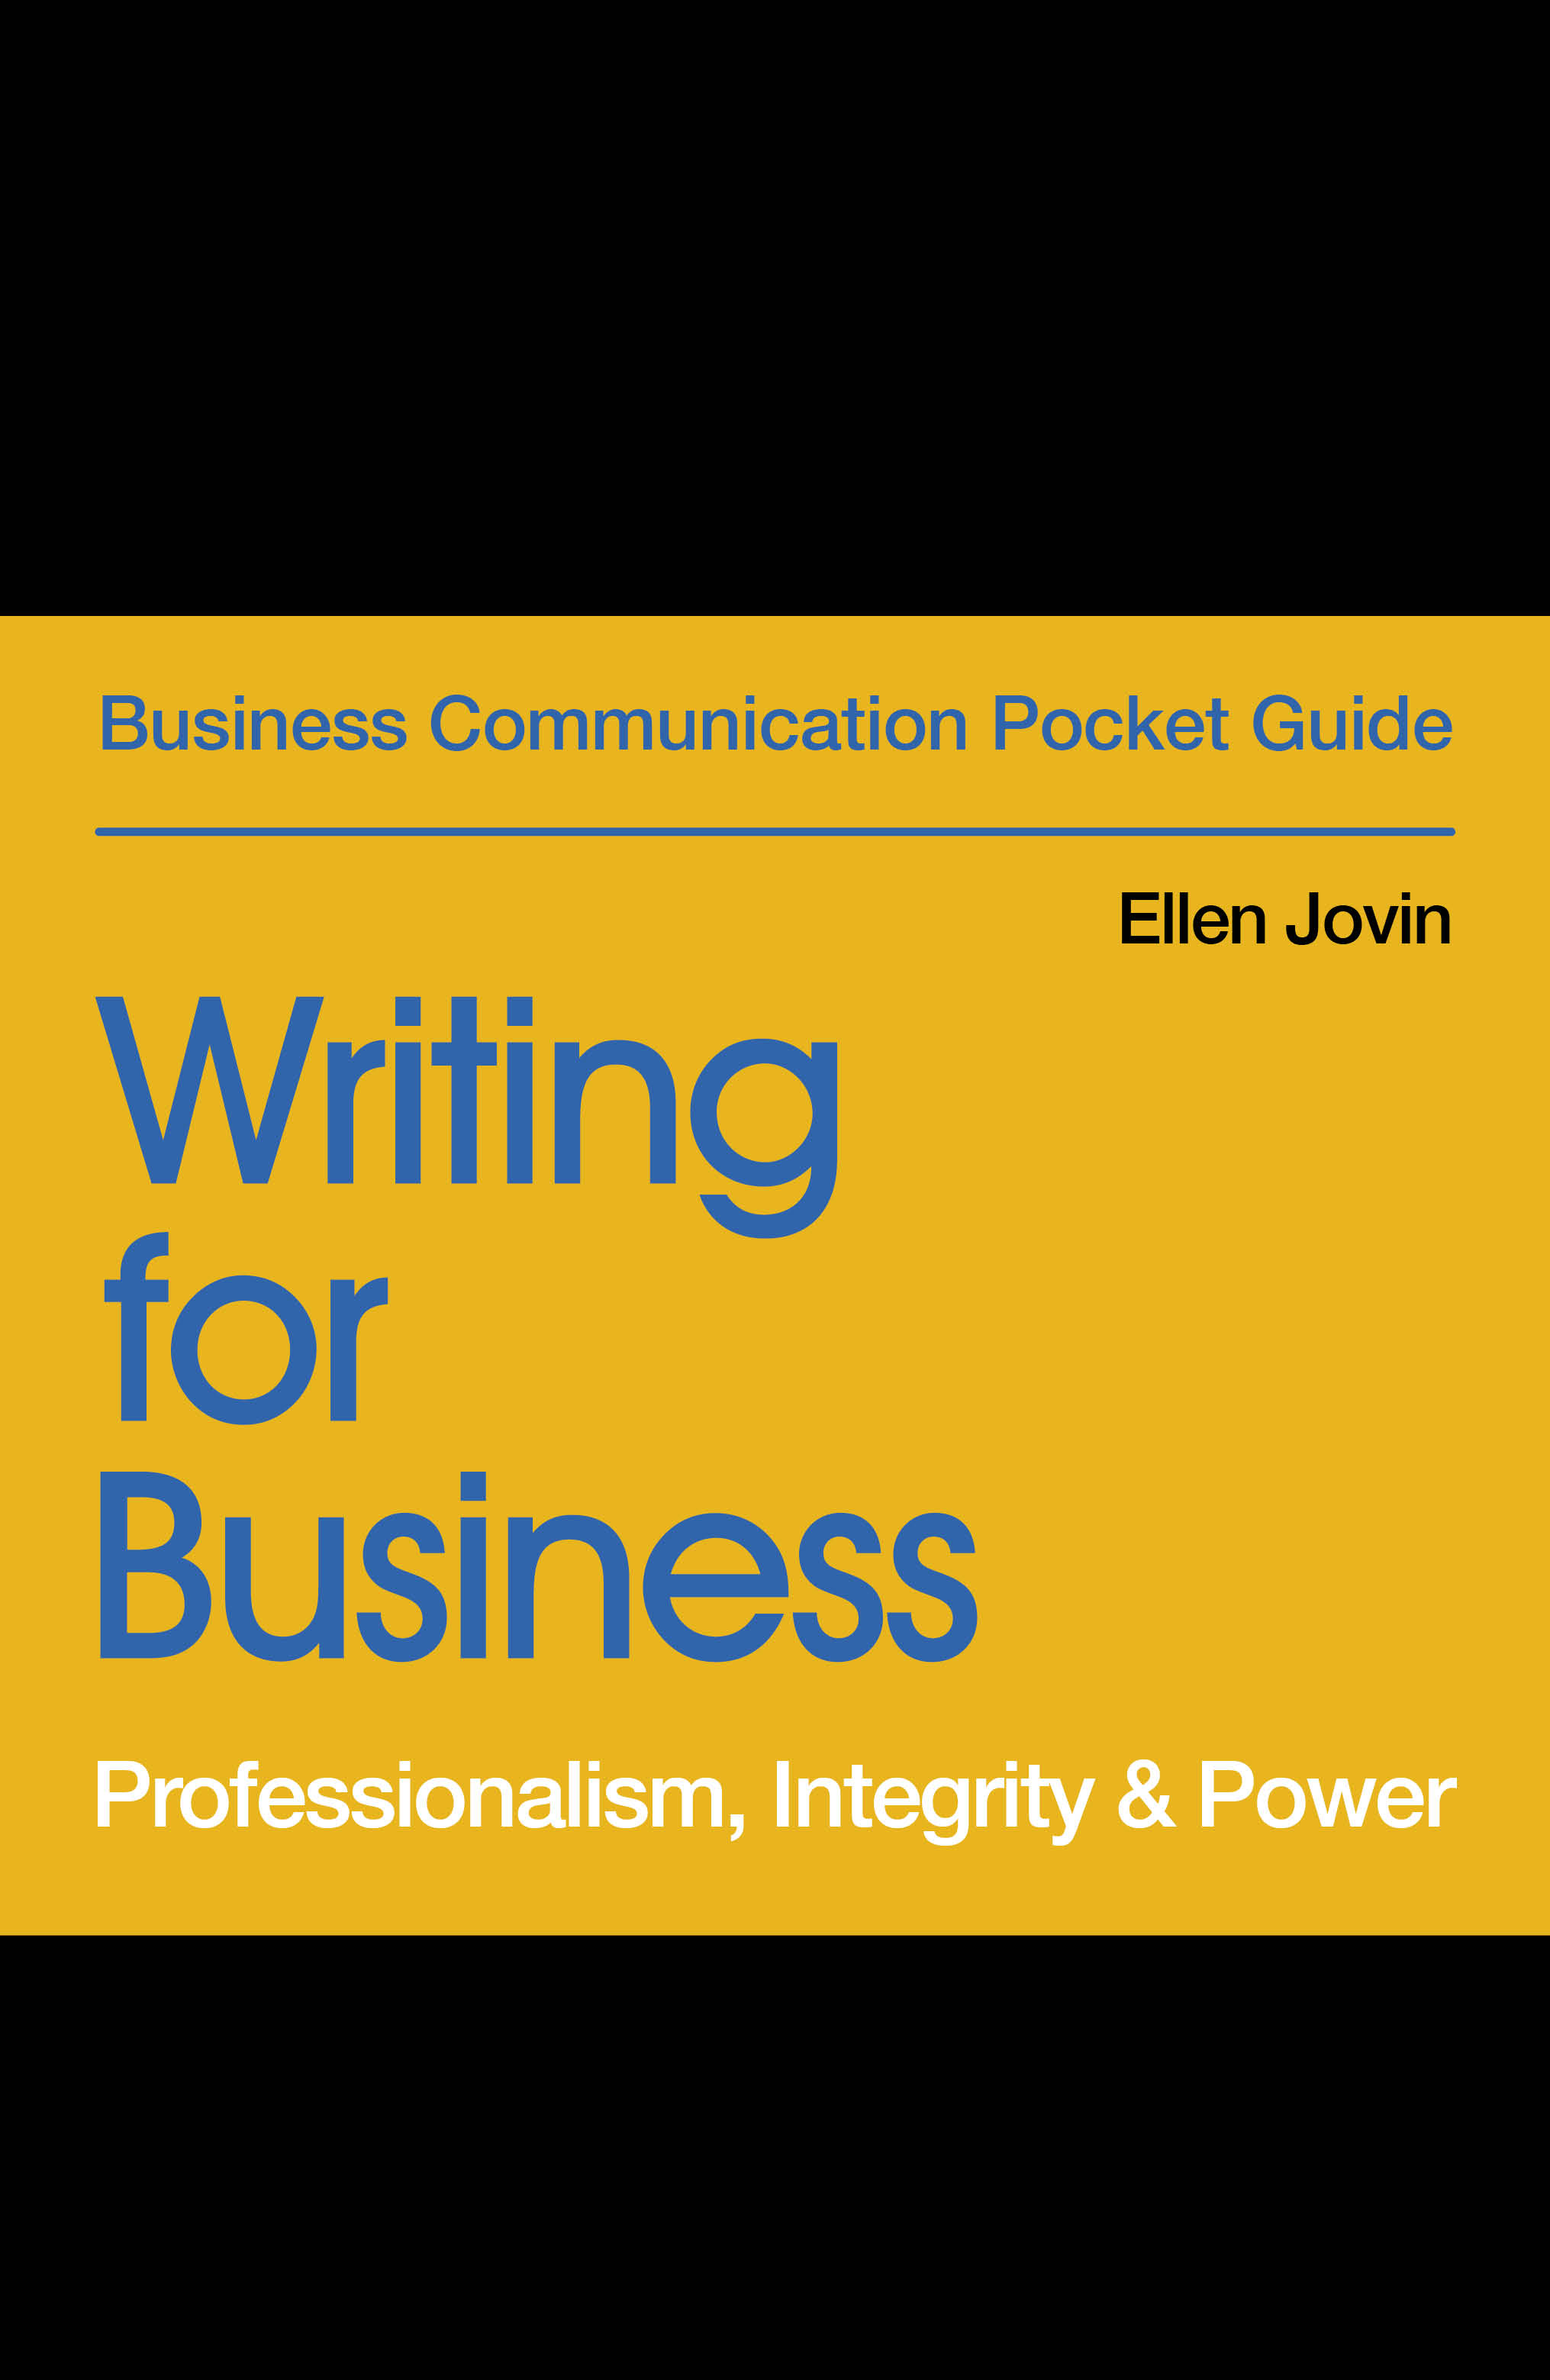 Business Communication Pocket Guide Series.jpg